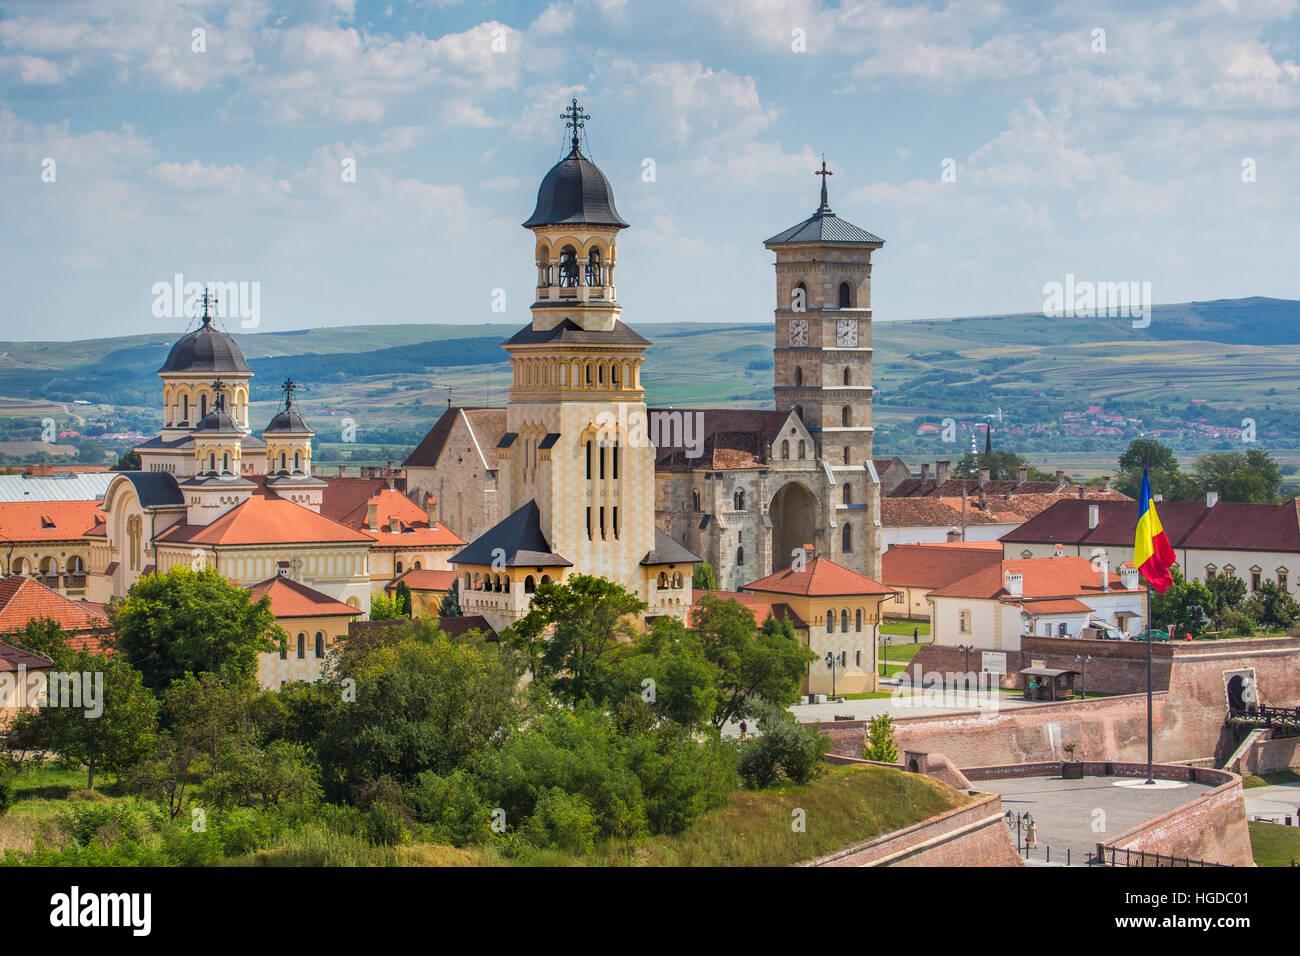 Romania, Alba Julia City, Alba Julia Citadel, Reintregirii Neamului Cathedral - Stock Image